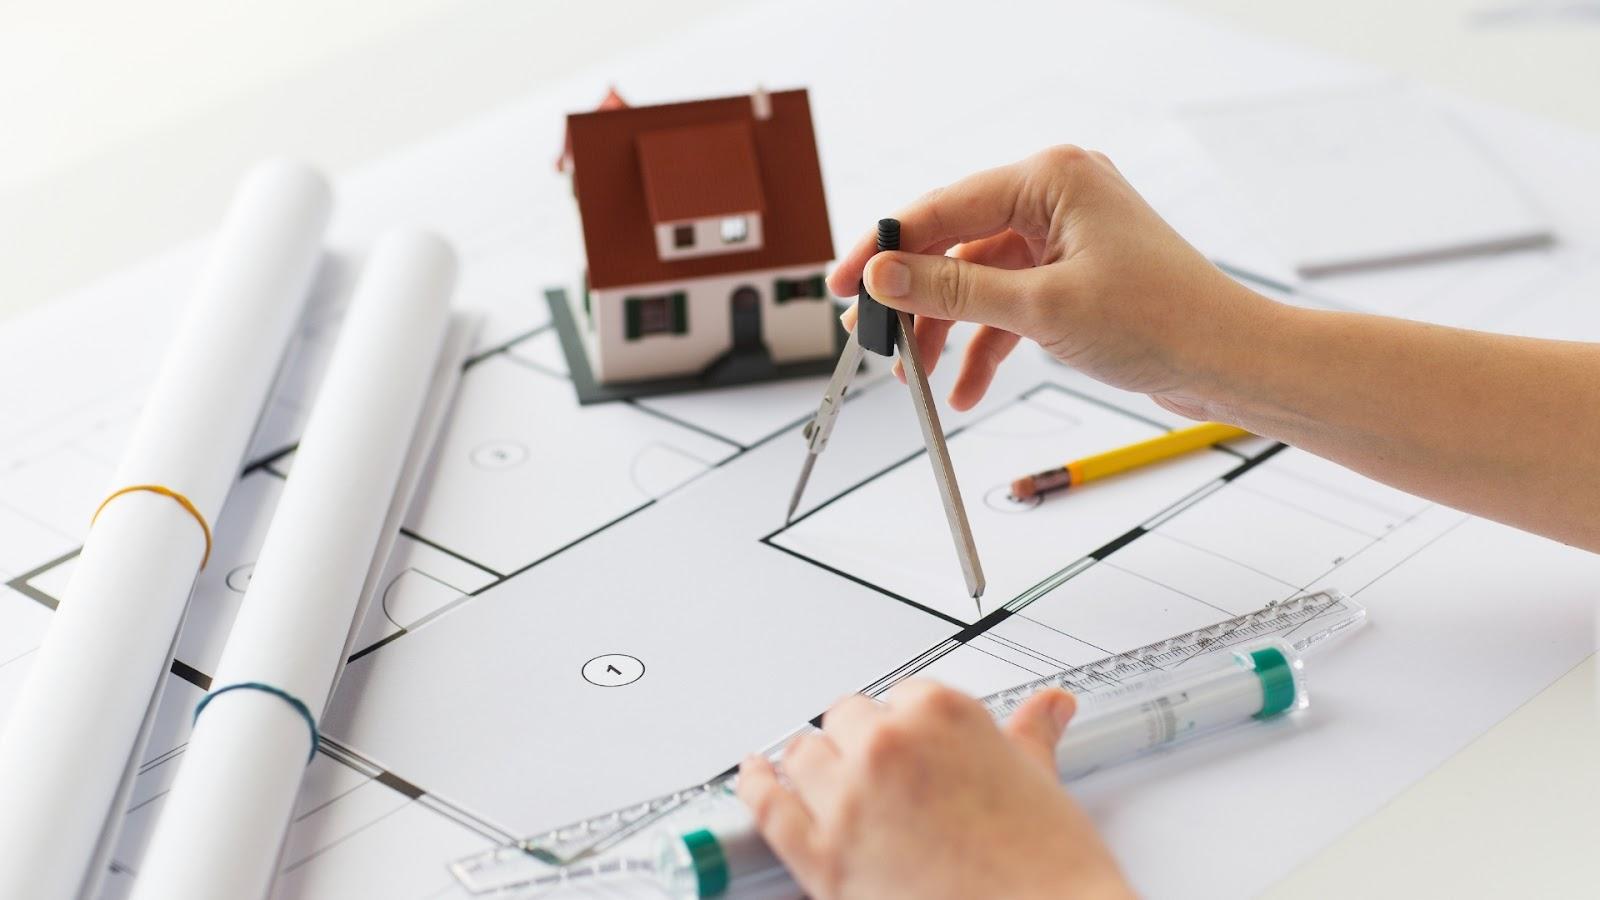 ergonomia na arquitetura